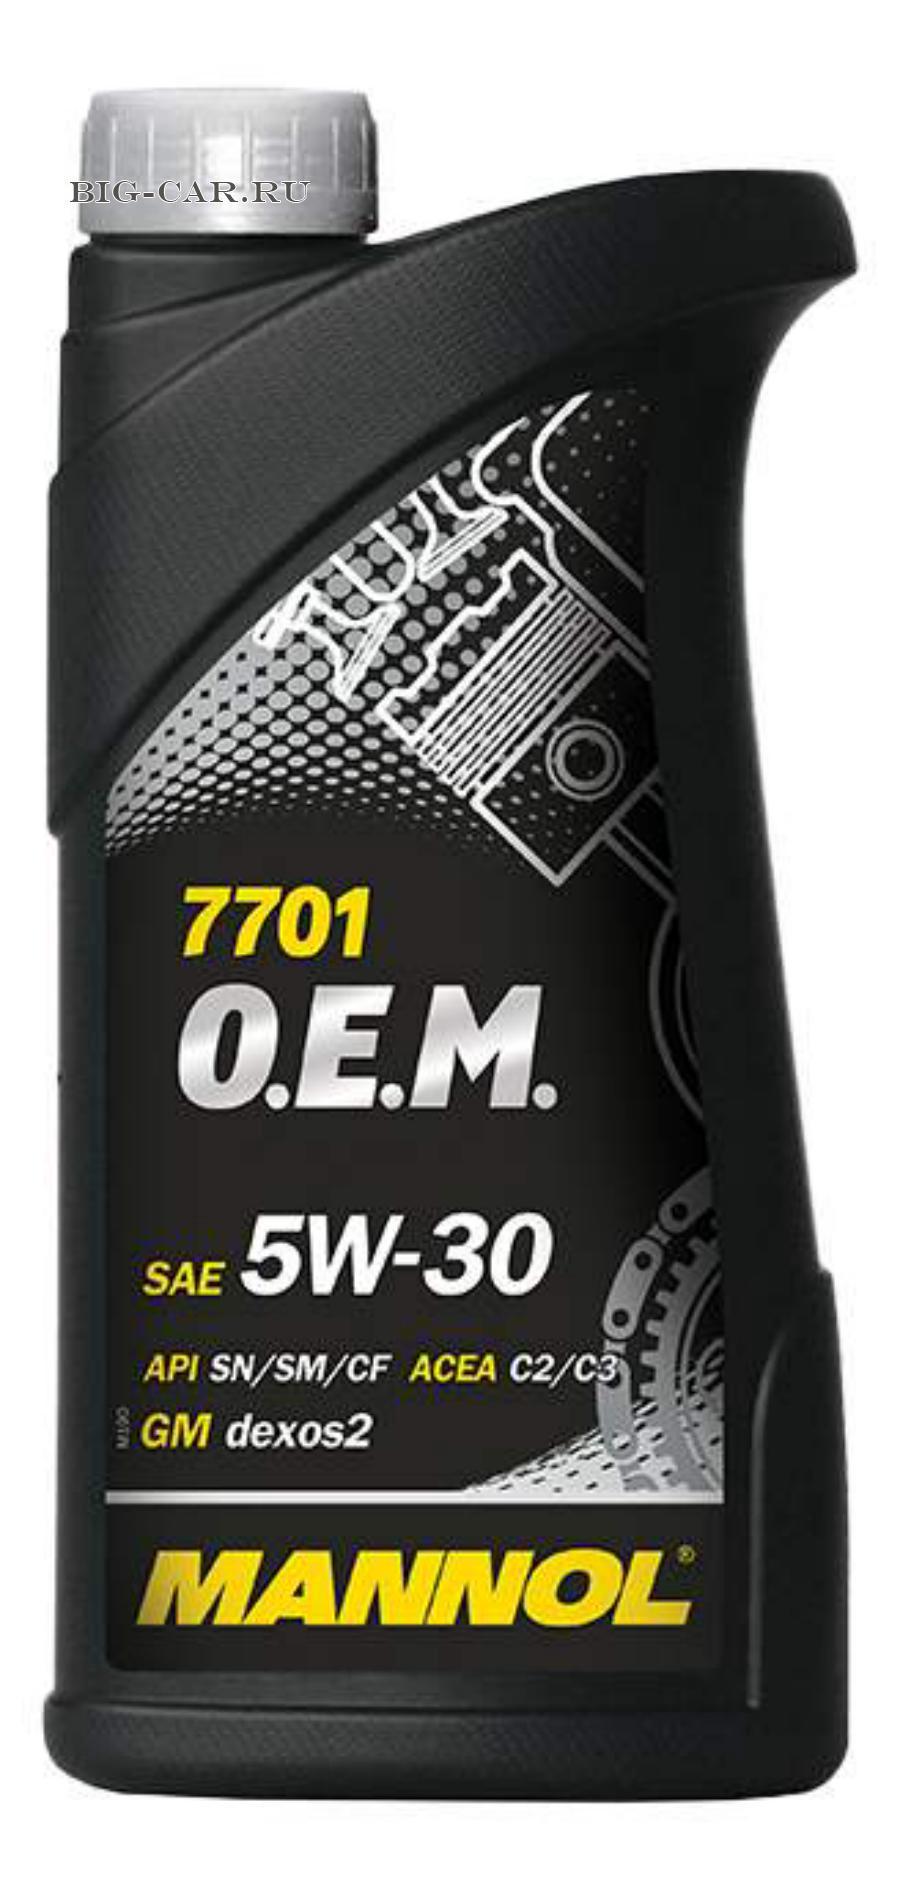 Масло моторное синтетическое 7701 O,E,M, for Chevrolet Opel 5W-30, 1л